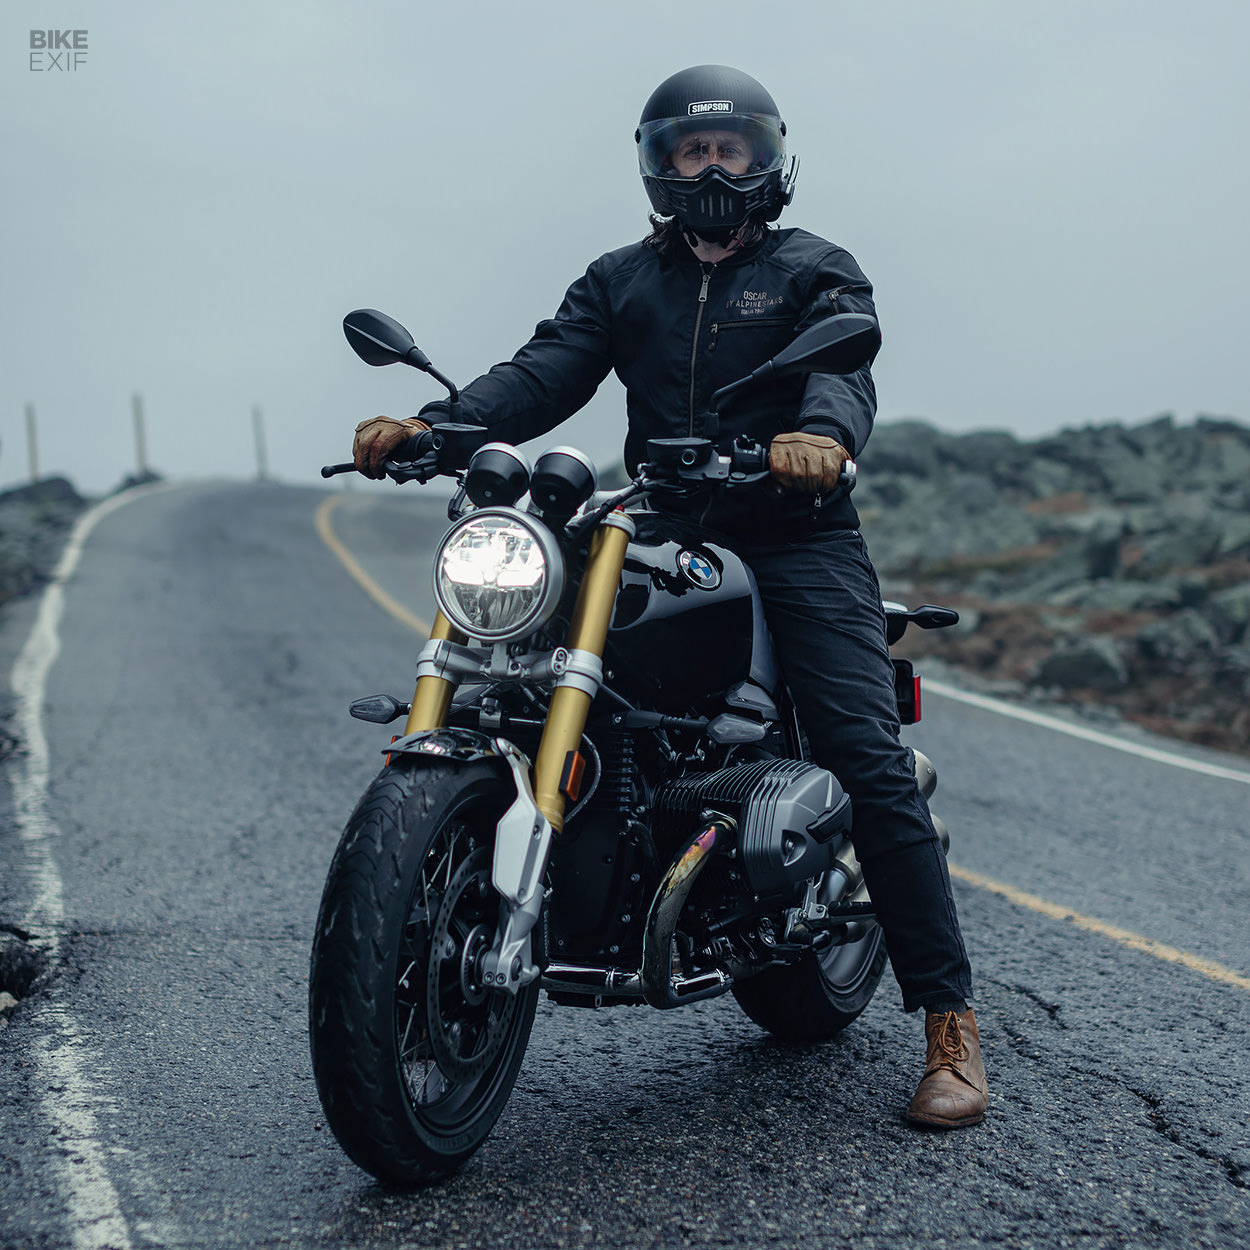 Pando Moto Boss Dyn 01 riding jeans